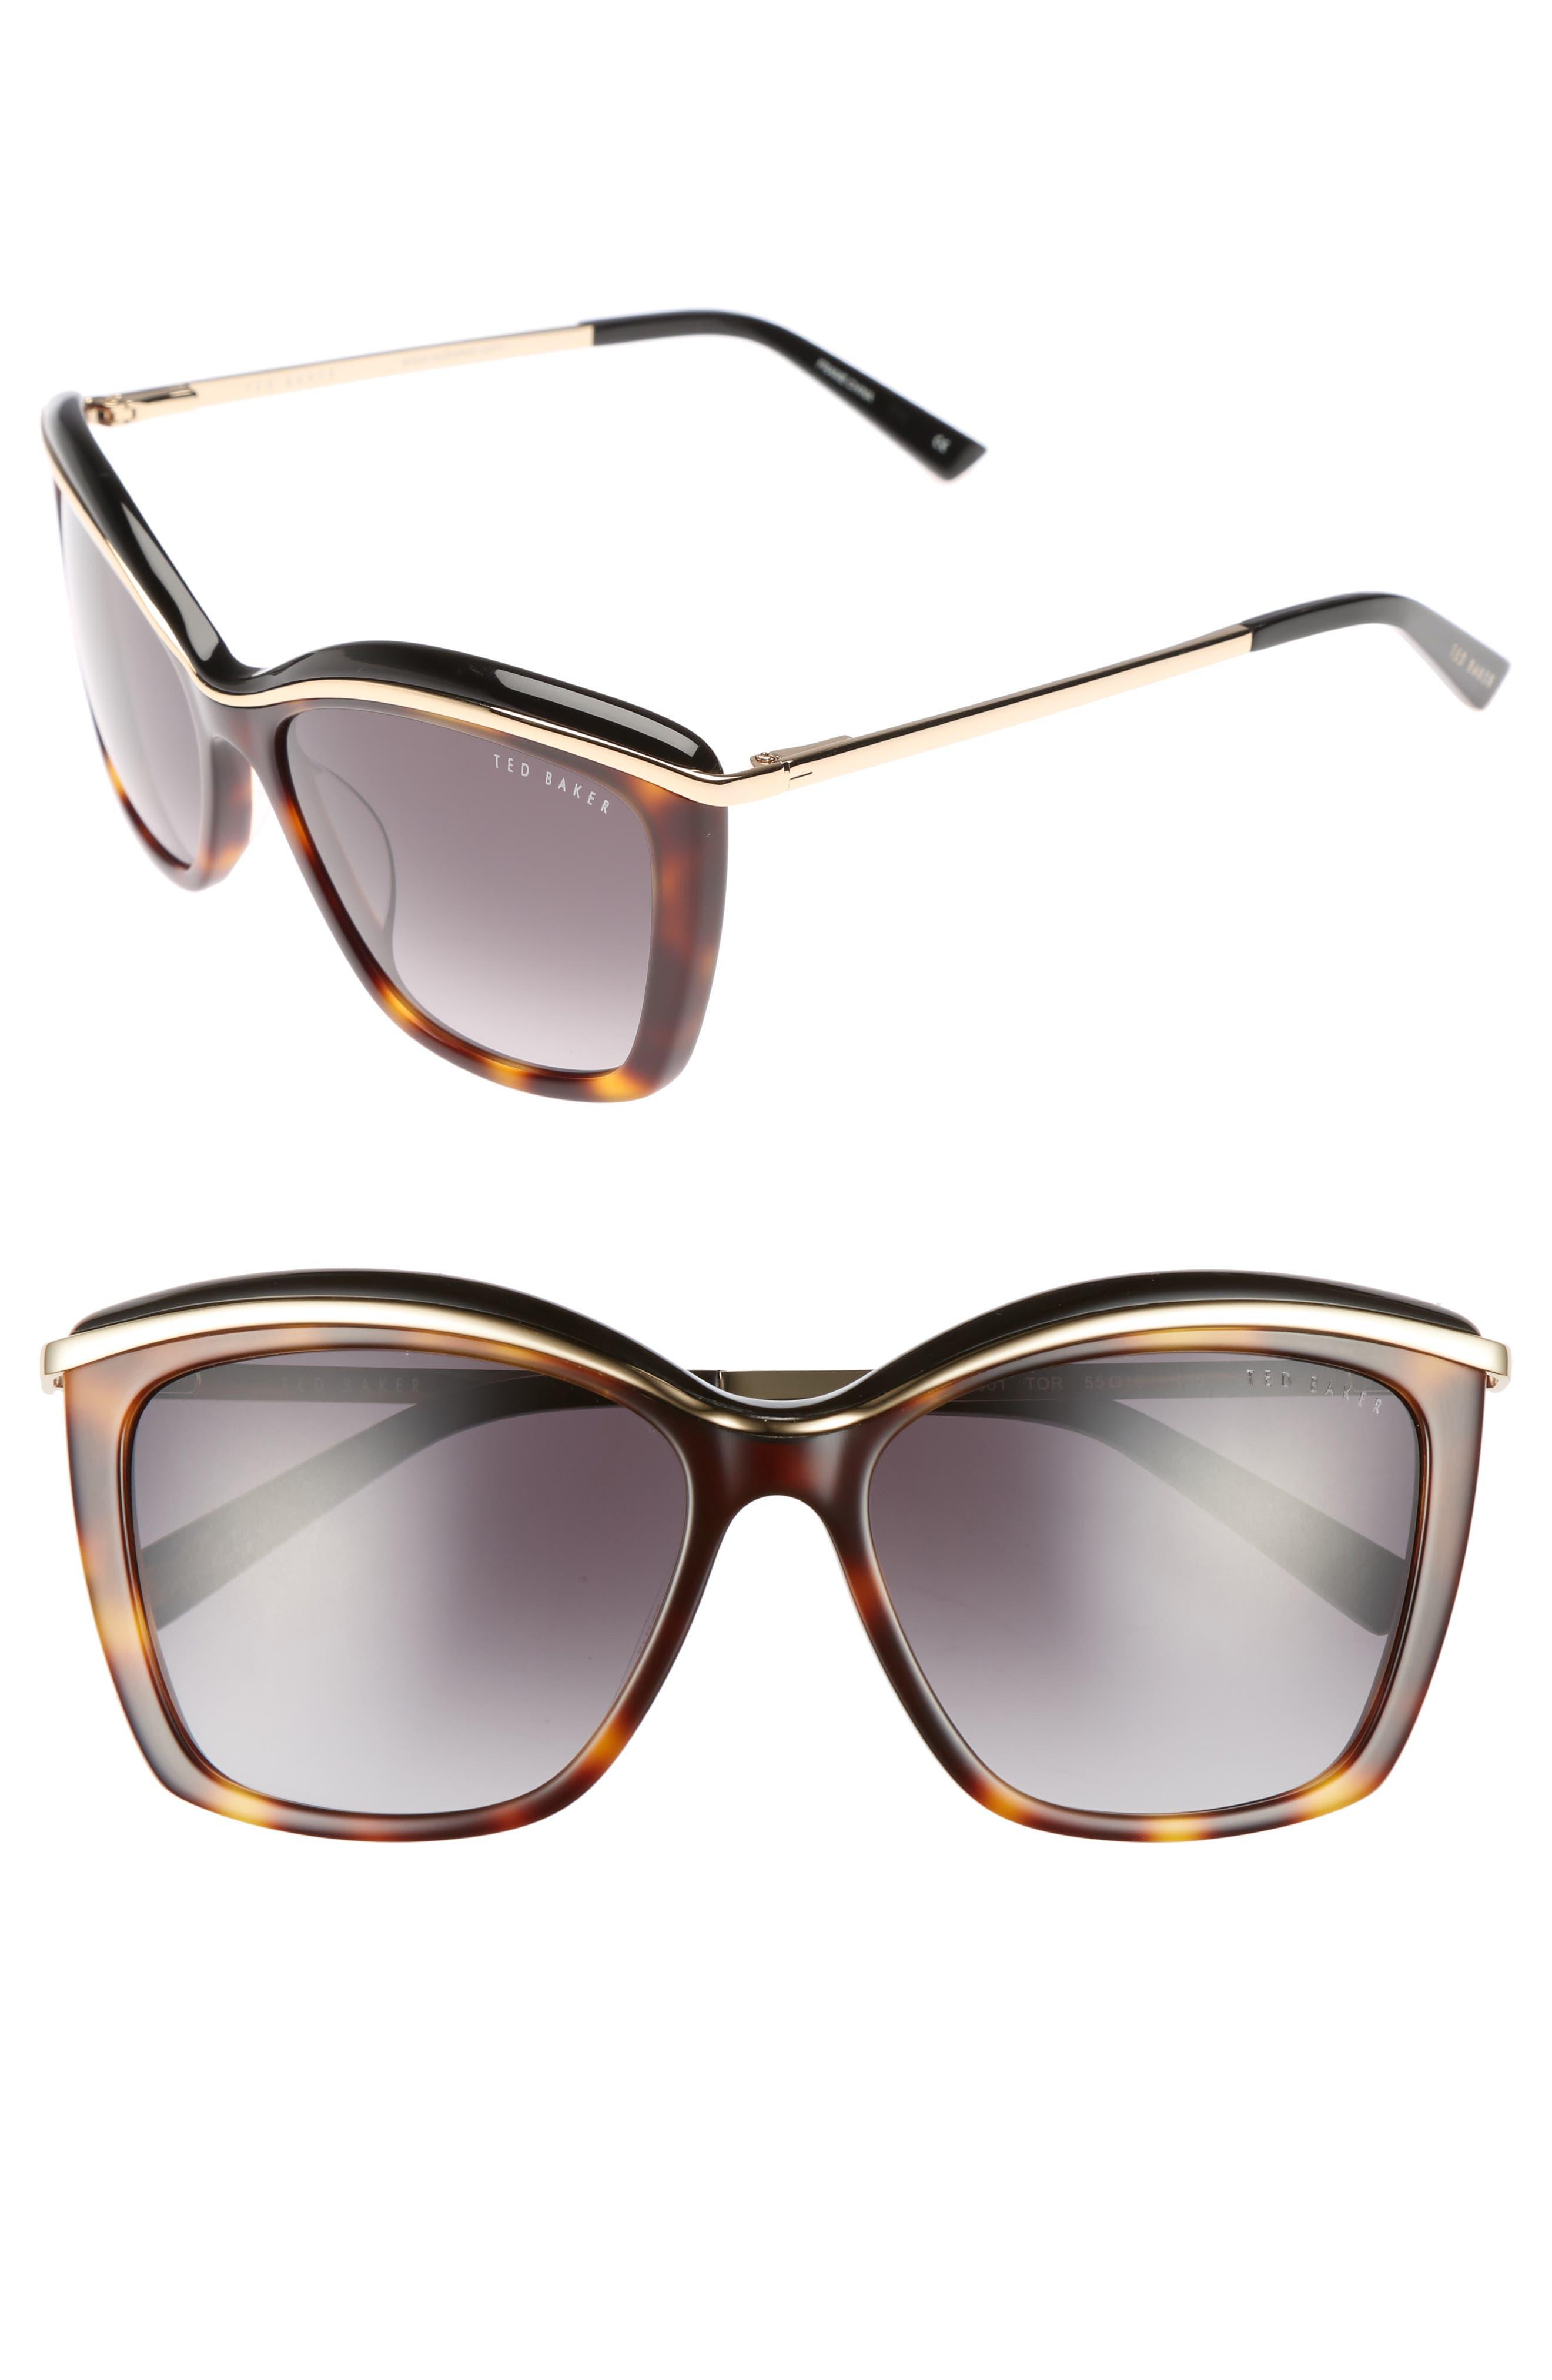 55mm Cat Eye Sunglasses,                             Main thumbnail 1, color,                             Tortoise